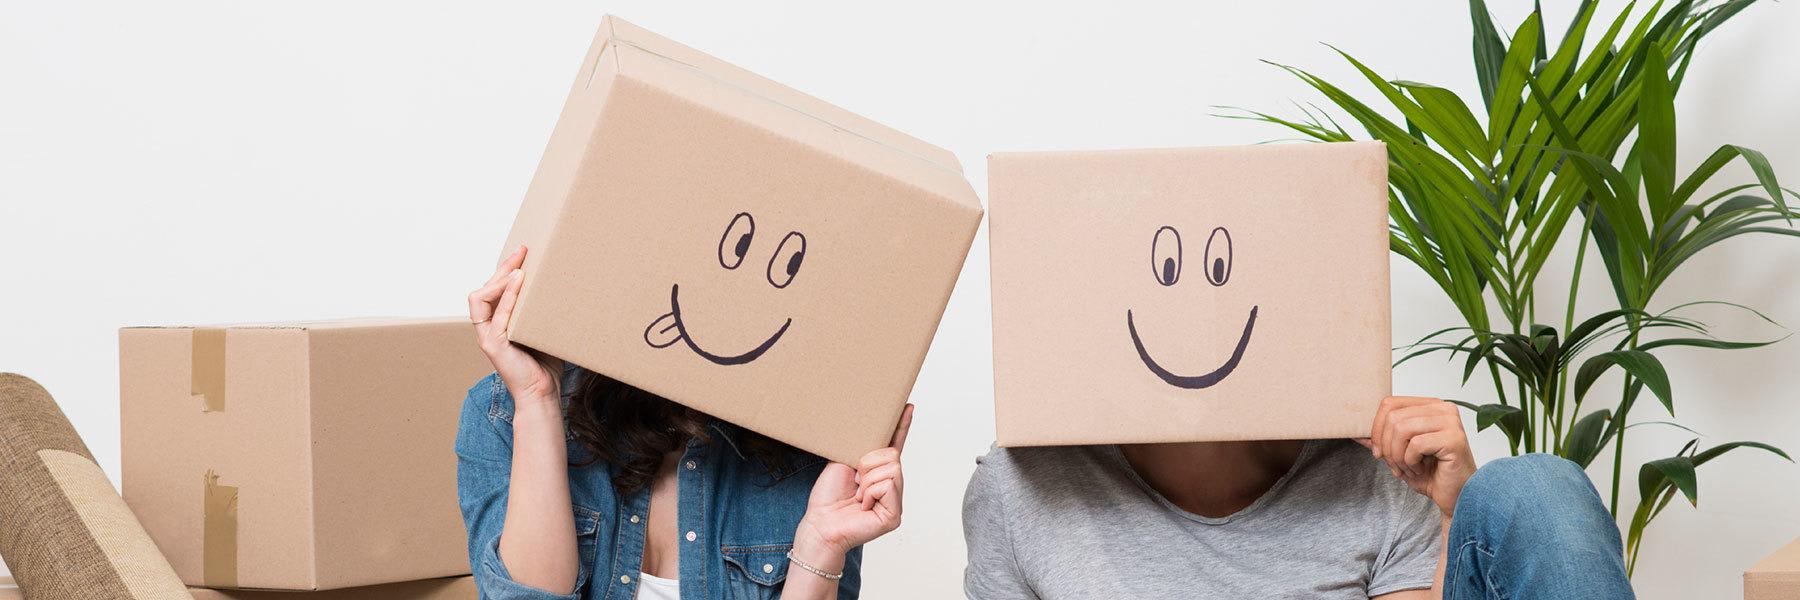 Funny box faces image